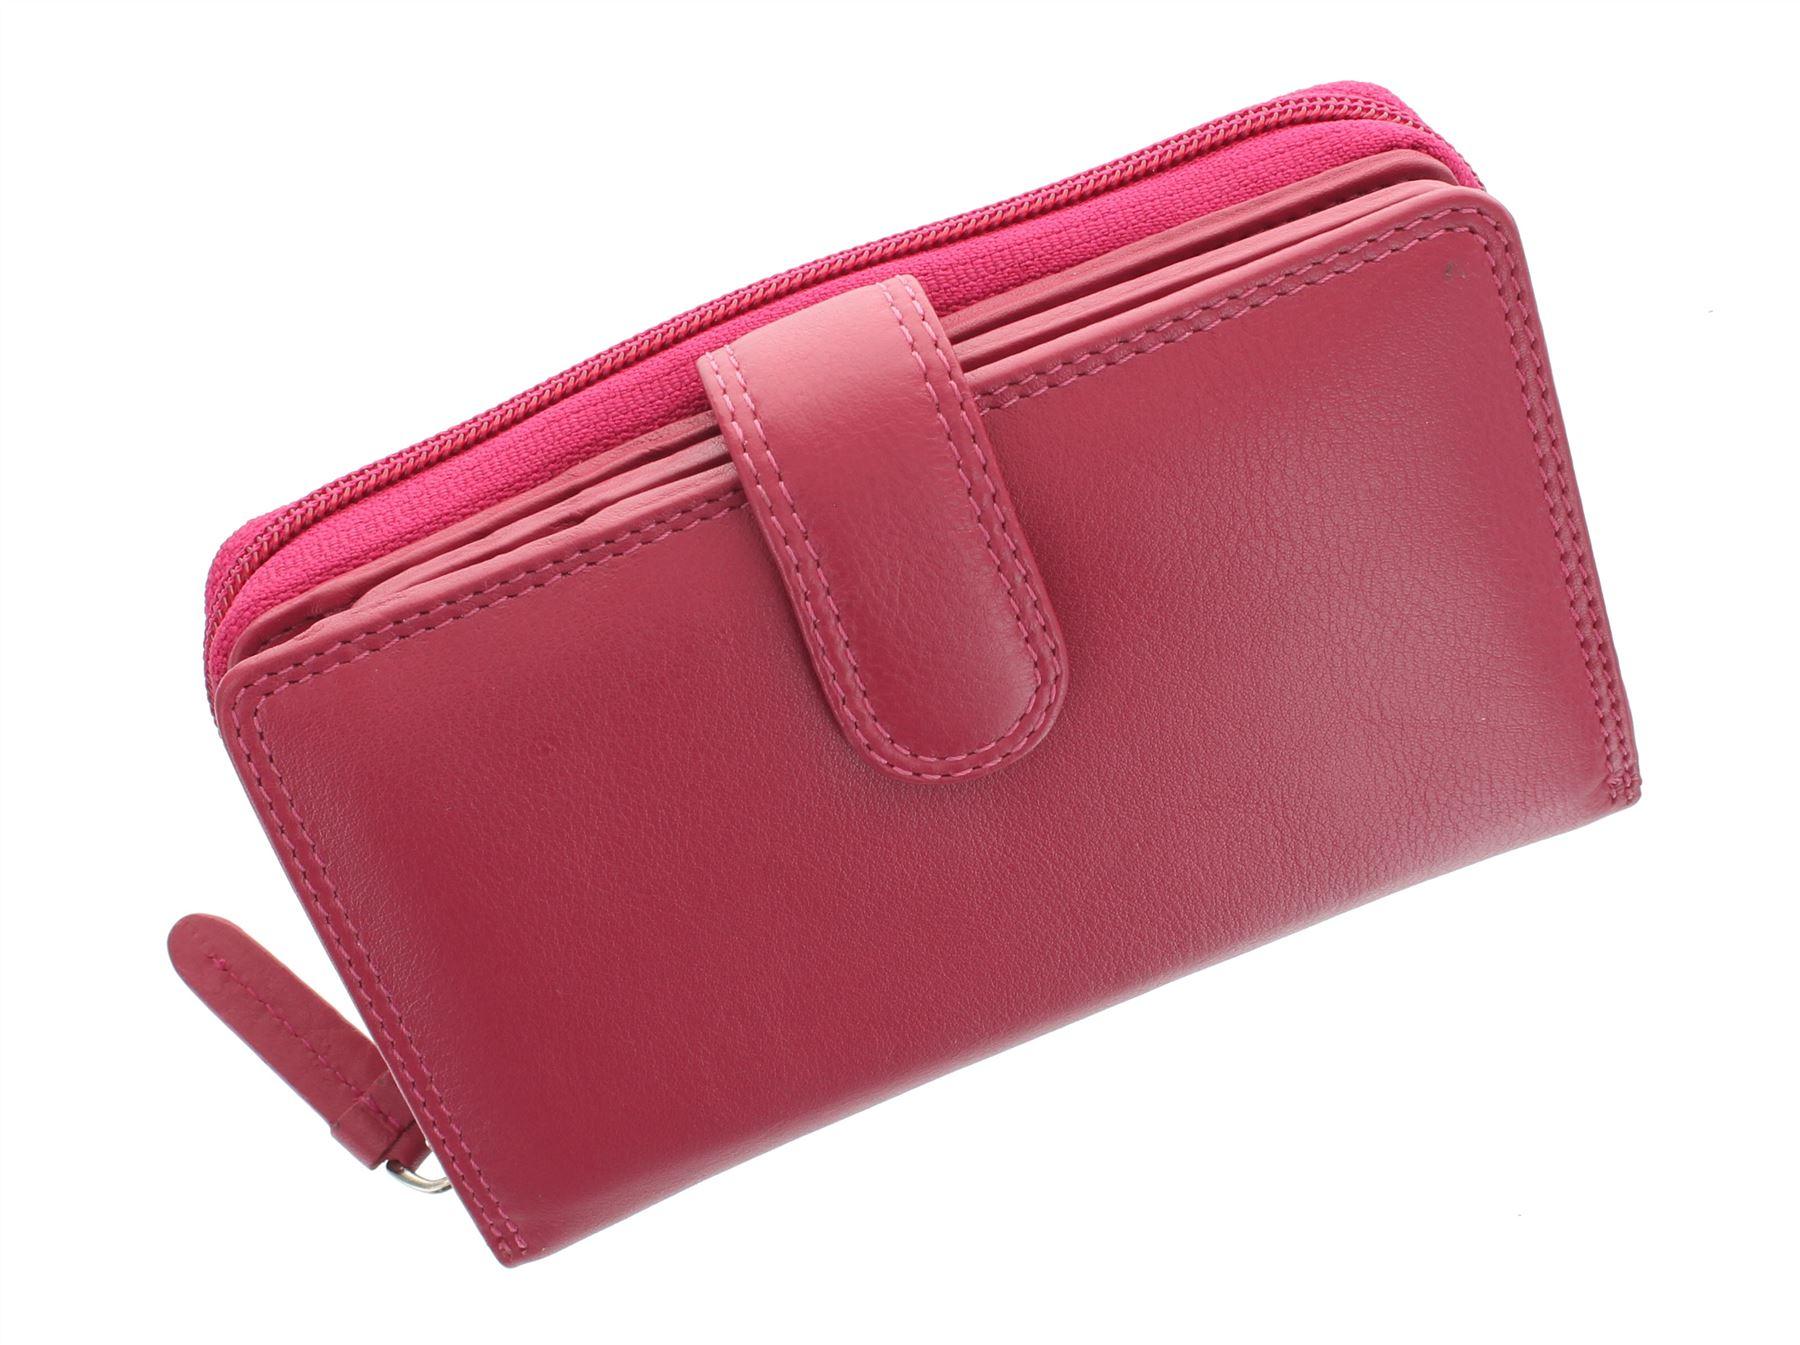 Visconti-Heritage-Collection-MADAME-Leather-Purse-Tab-Closure-RFID-blocking-HT33 miniatura 17